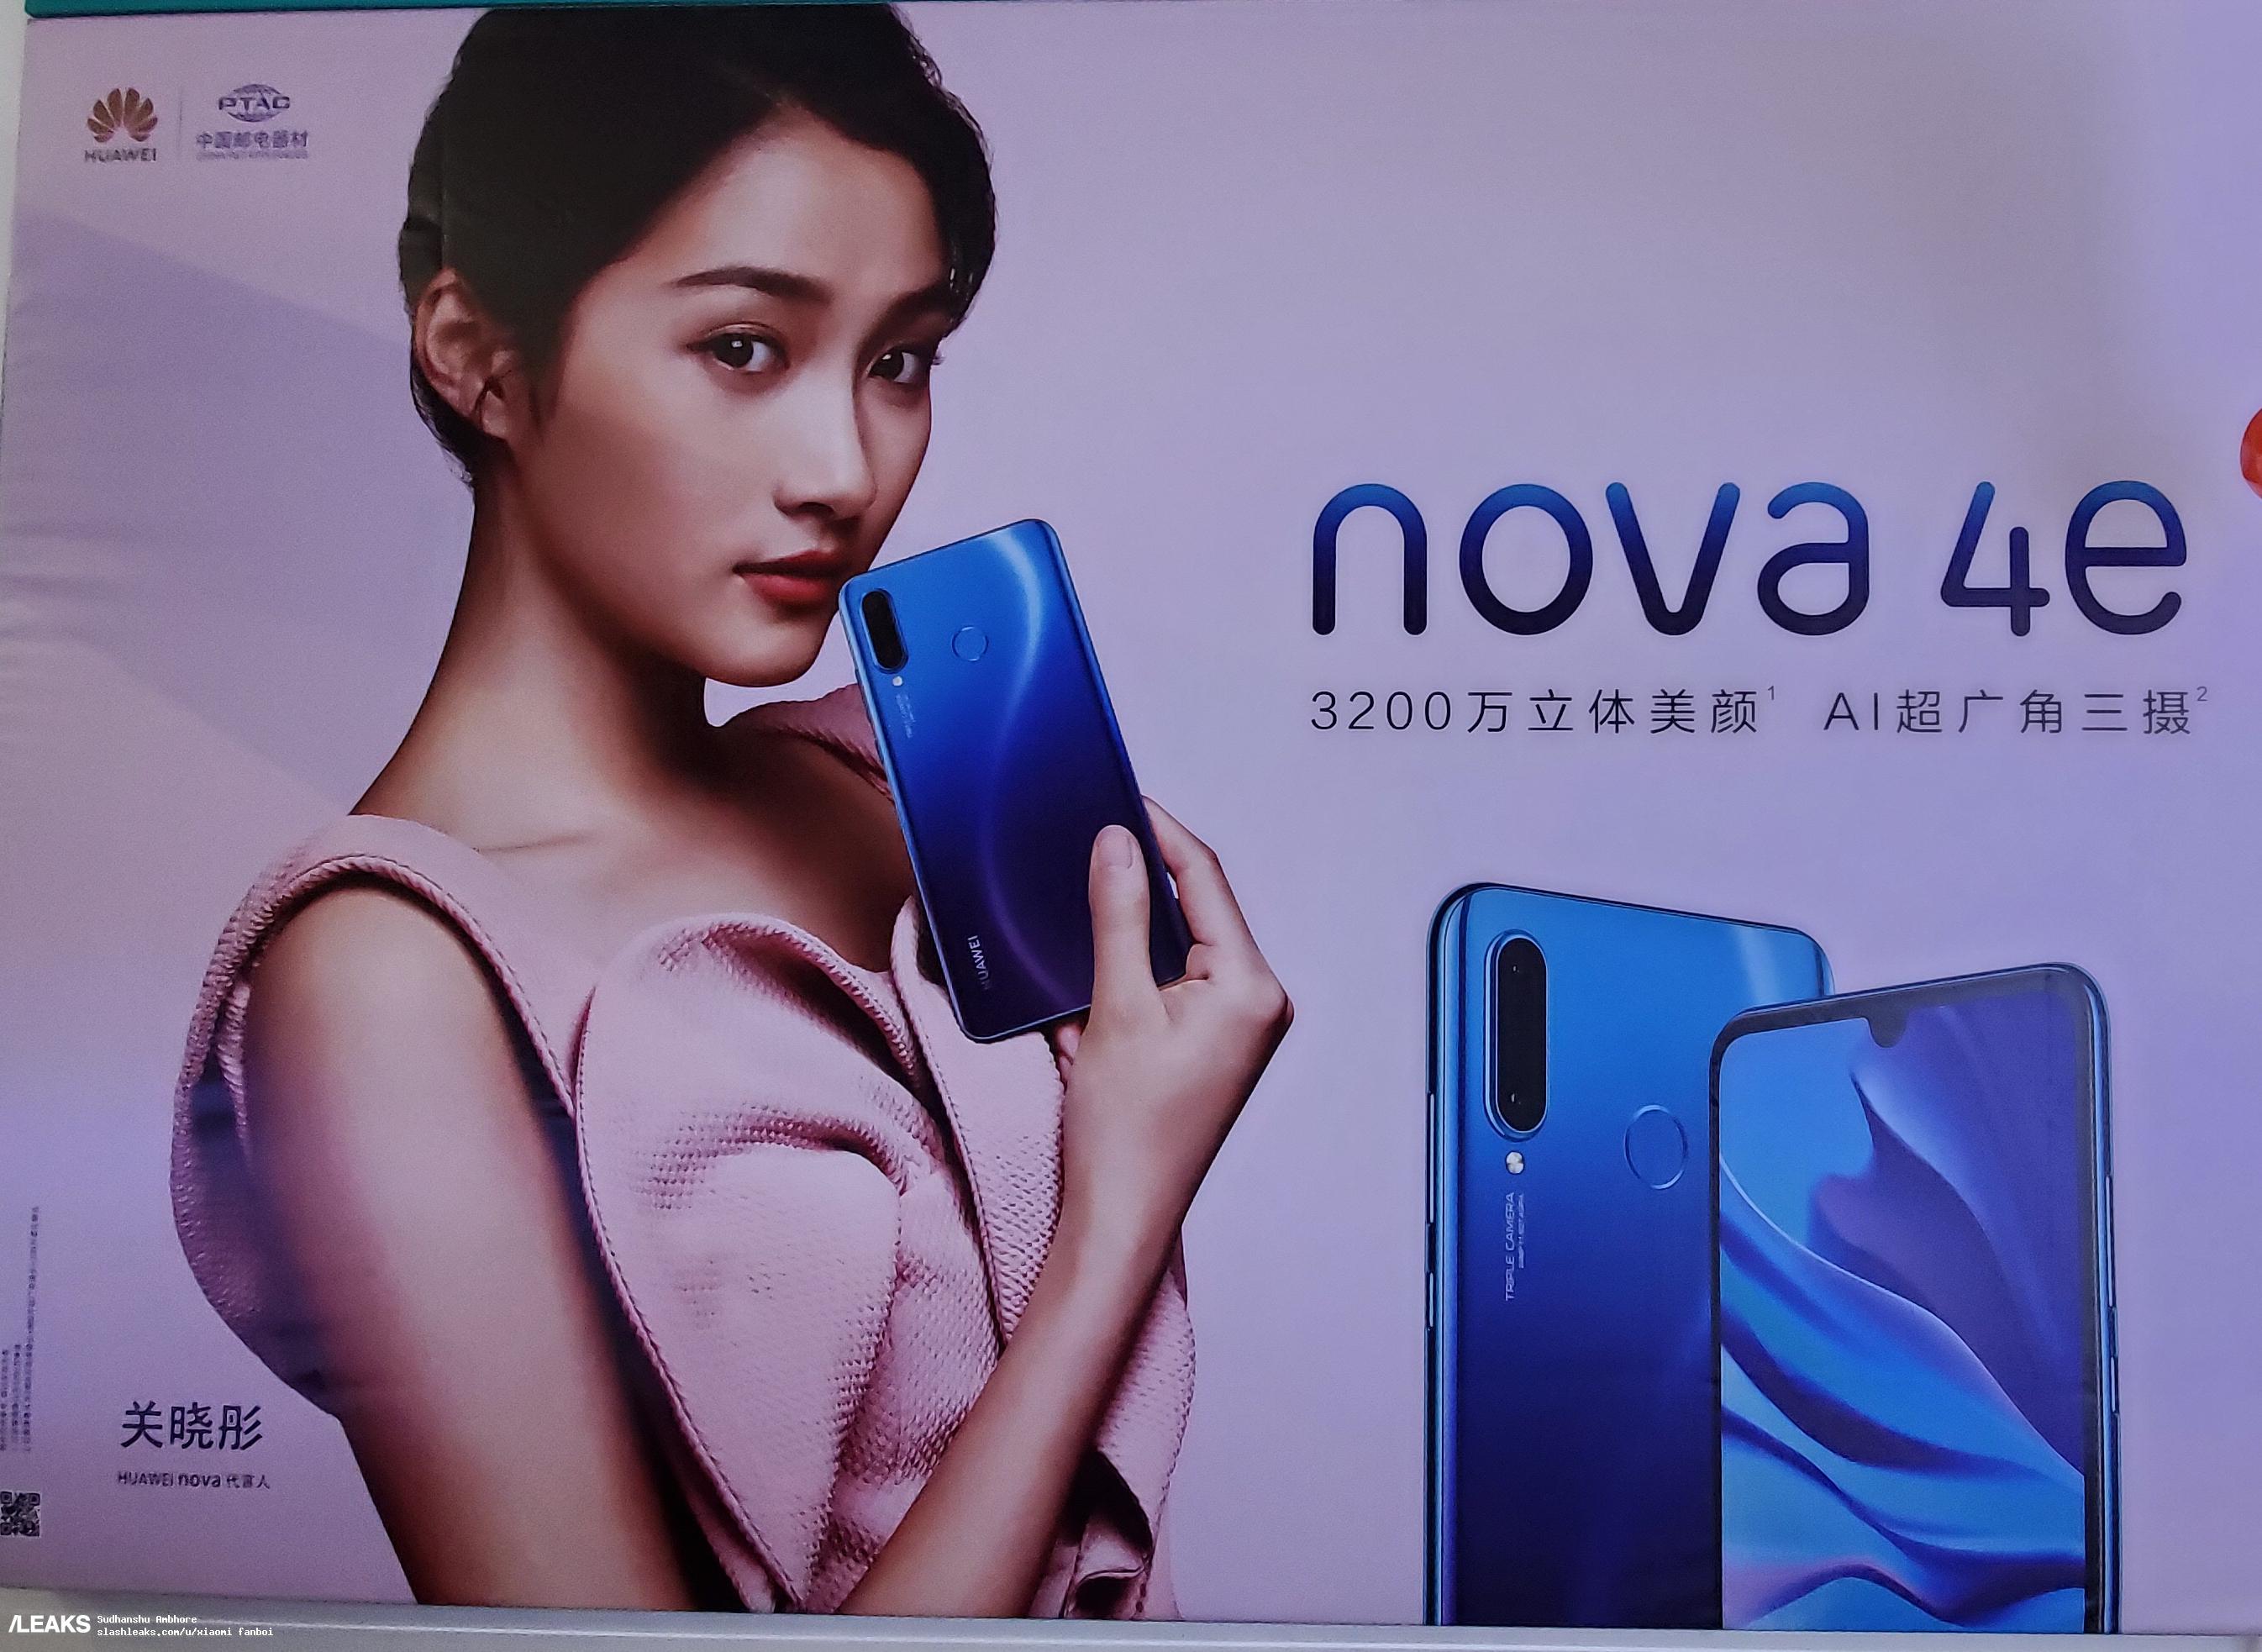 img Huawei Nova 4e (P30 Lite) promotional banner leaked